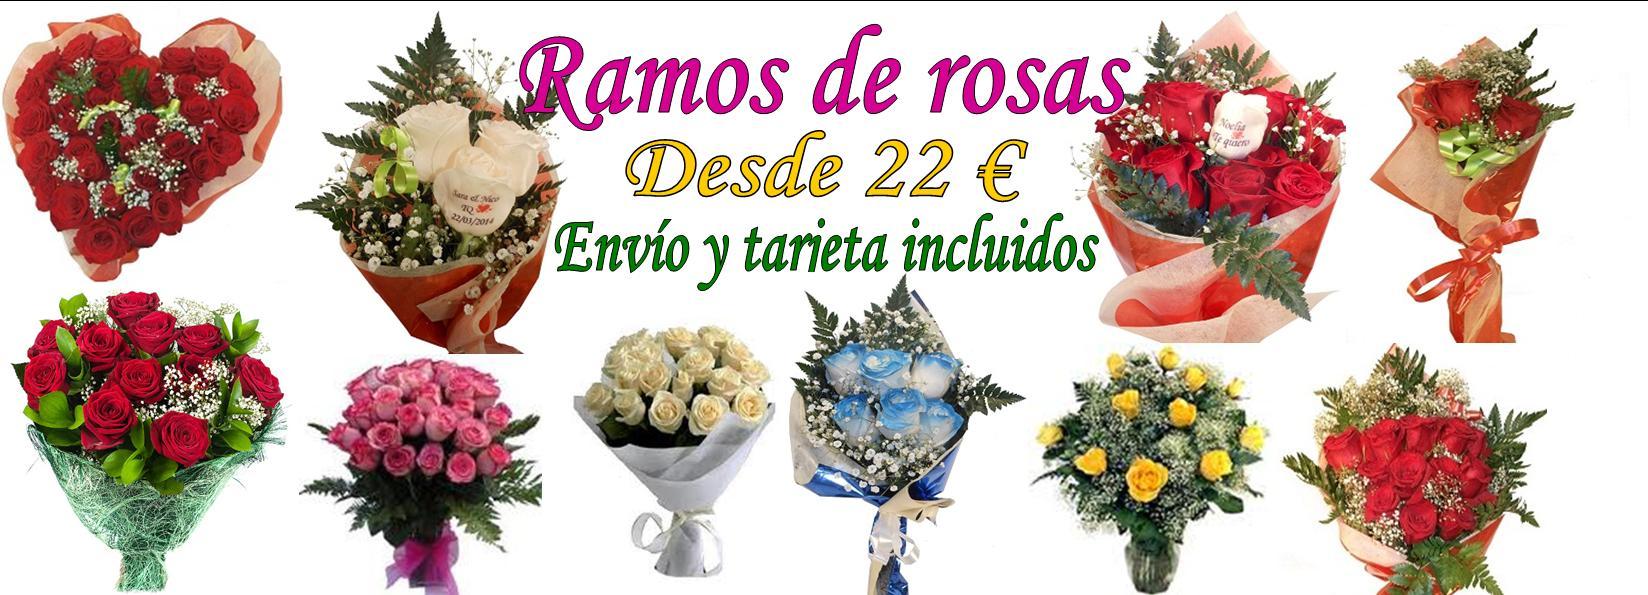 Enviar ramo de rosas desde 22 €